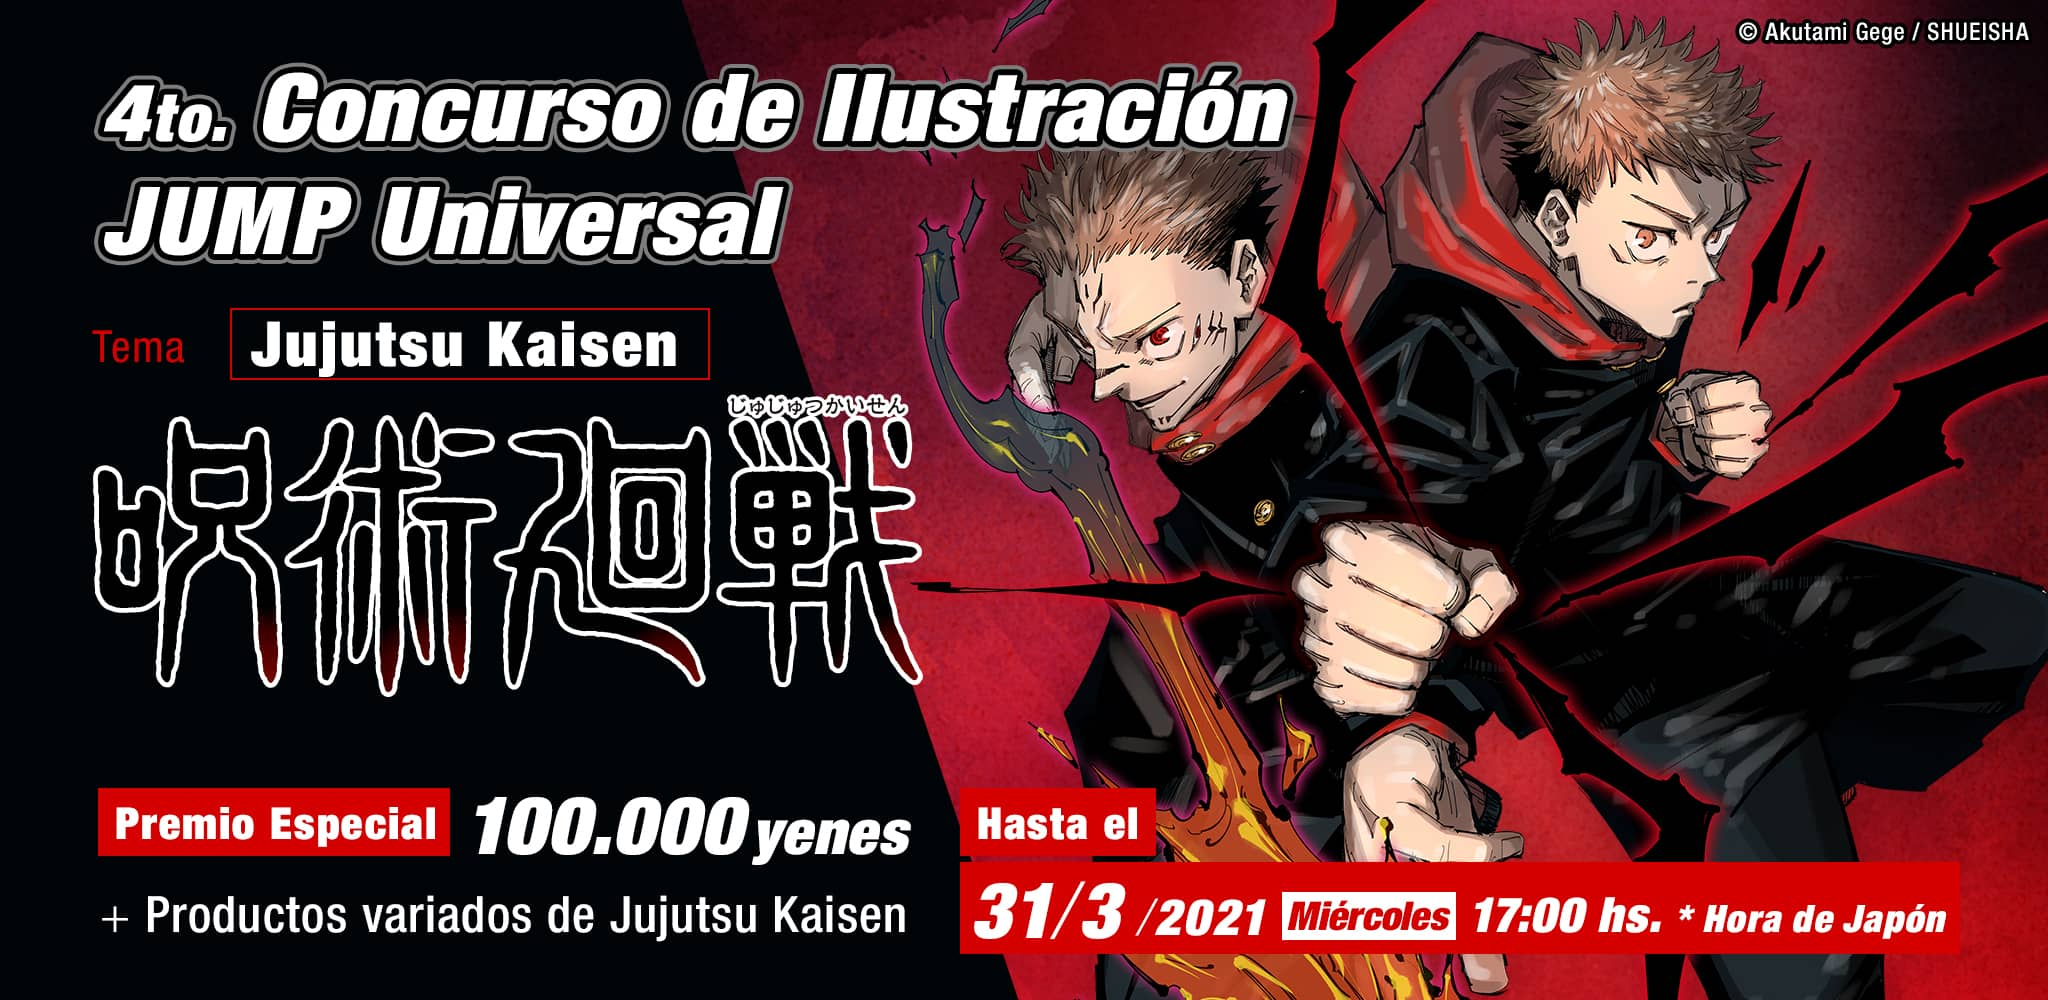 4to. Concurso de Ilustración JUMP Universal Tema: Jujutsu Kaisen